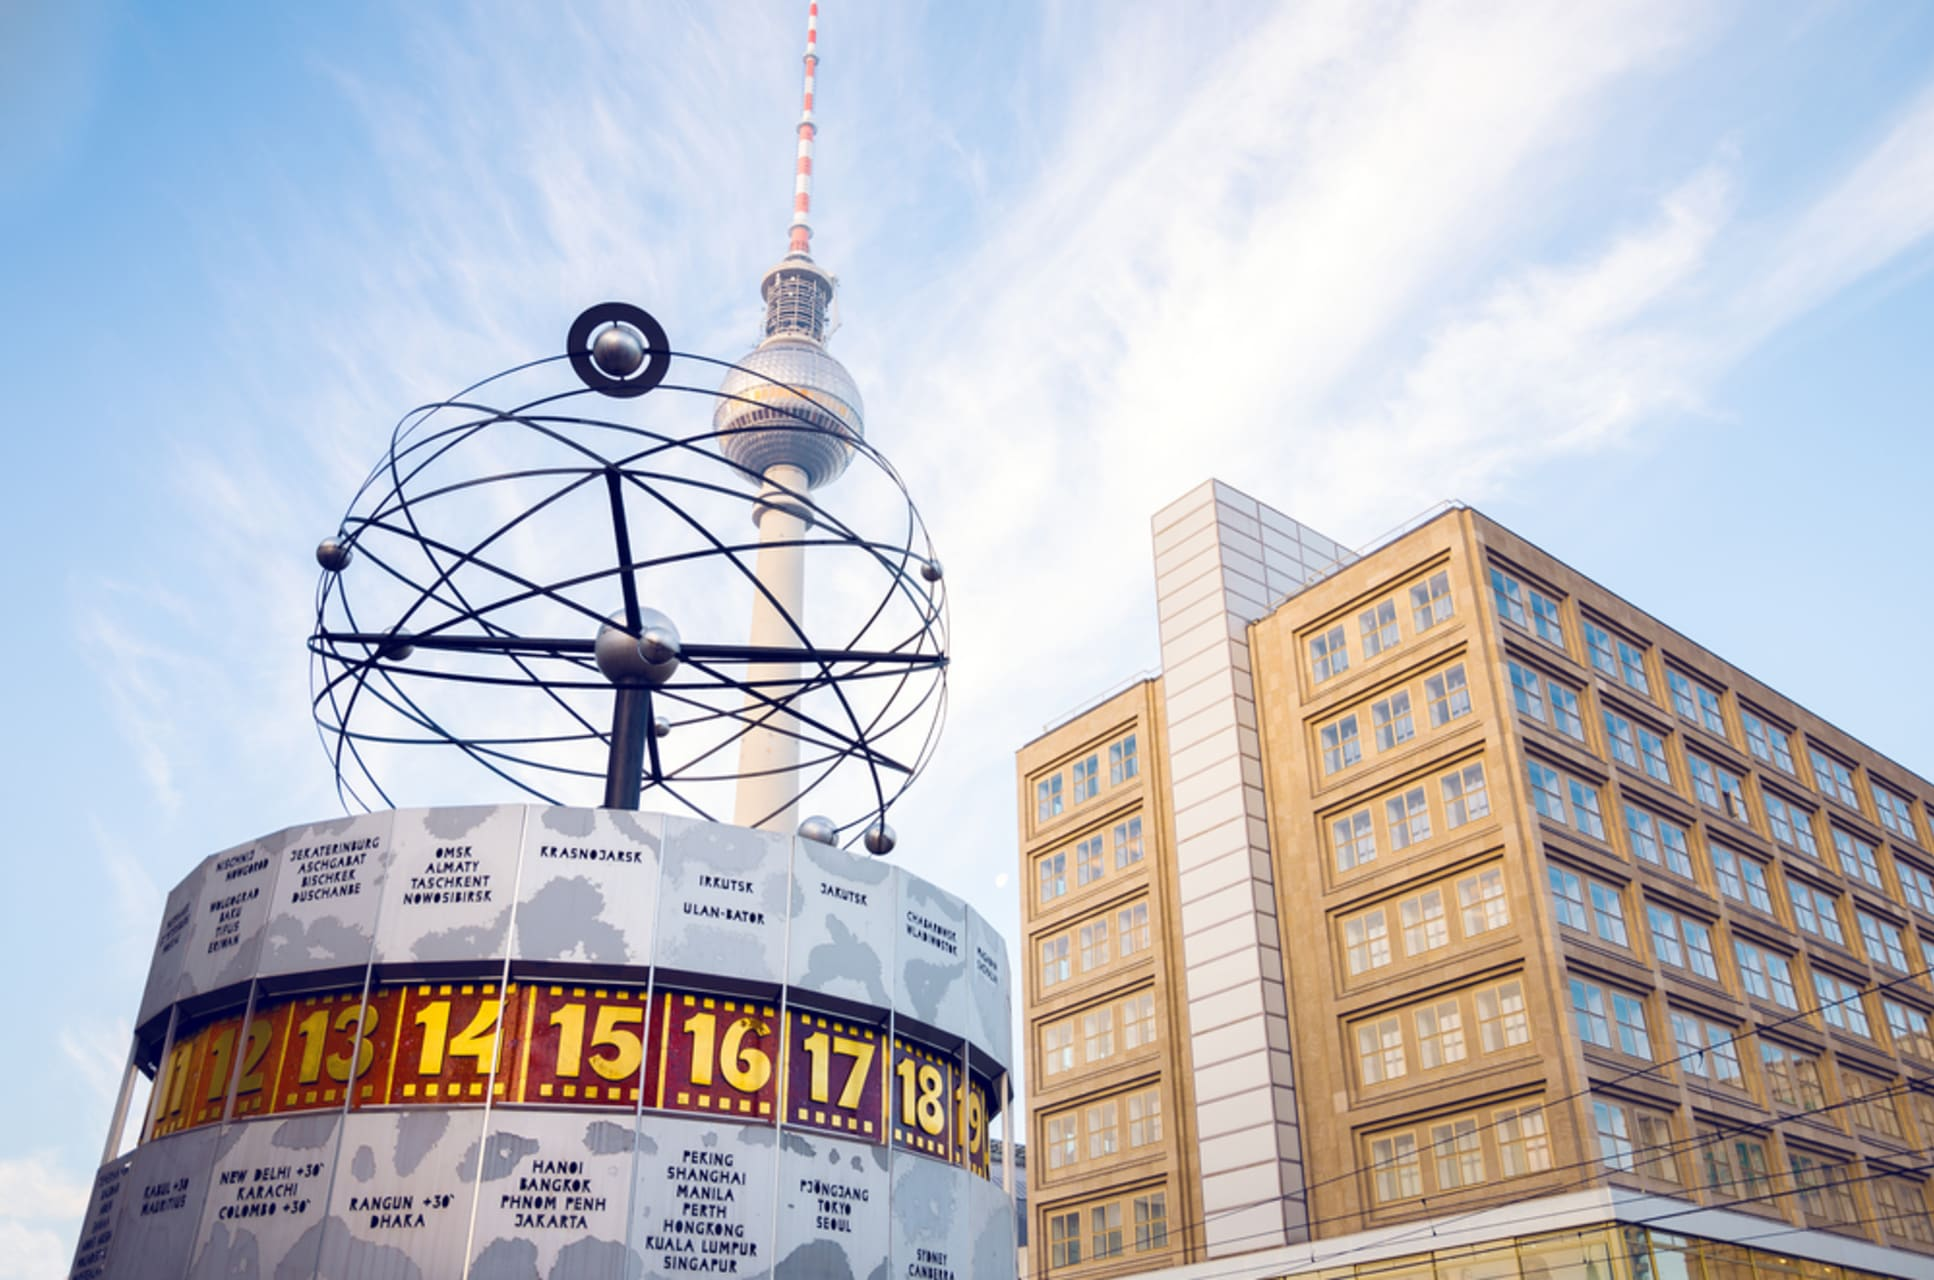 Berlin - Alexanderplatz – Old and New City Centre